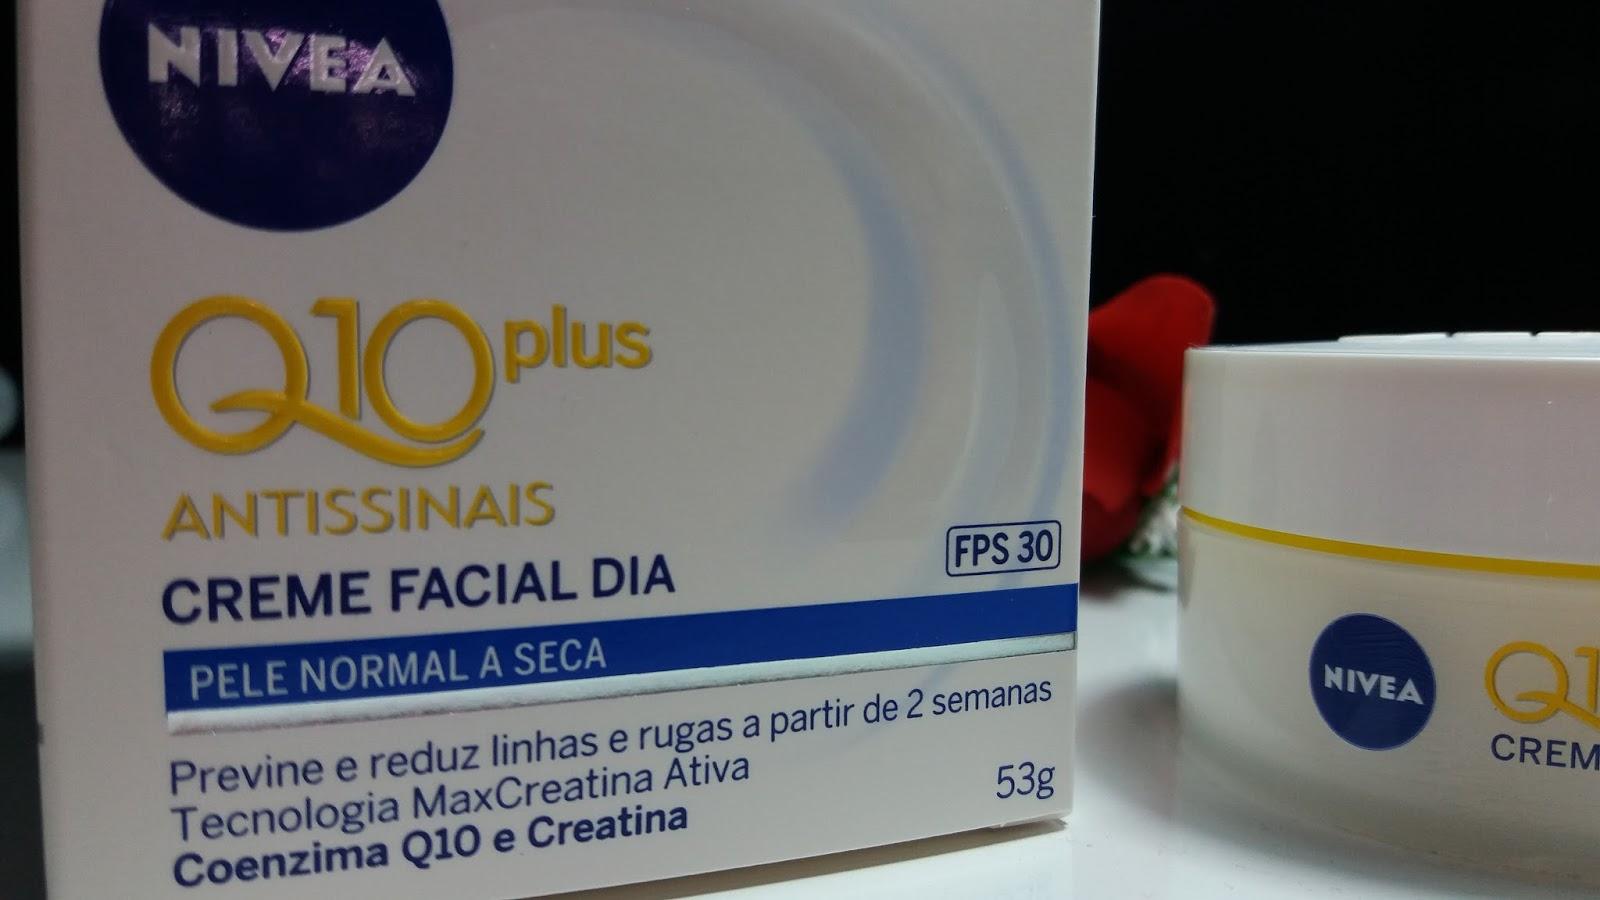 Nivea Q 10 Plus Antissinais  #eu testei